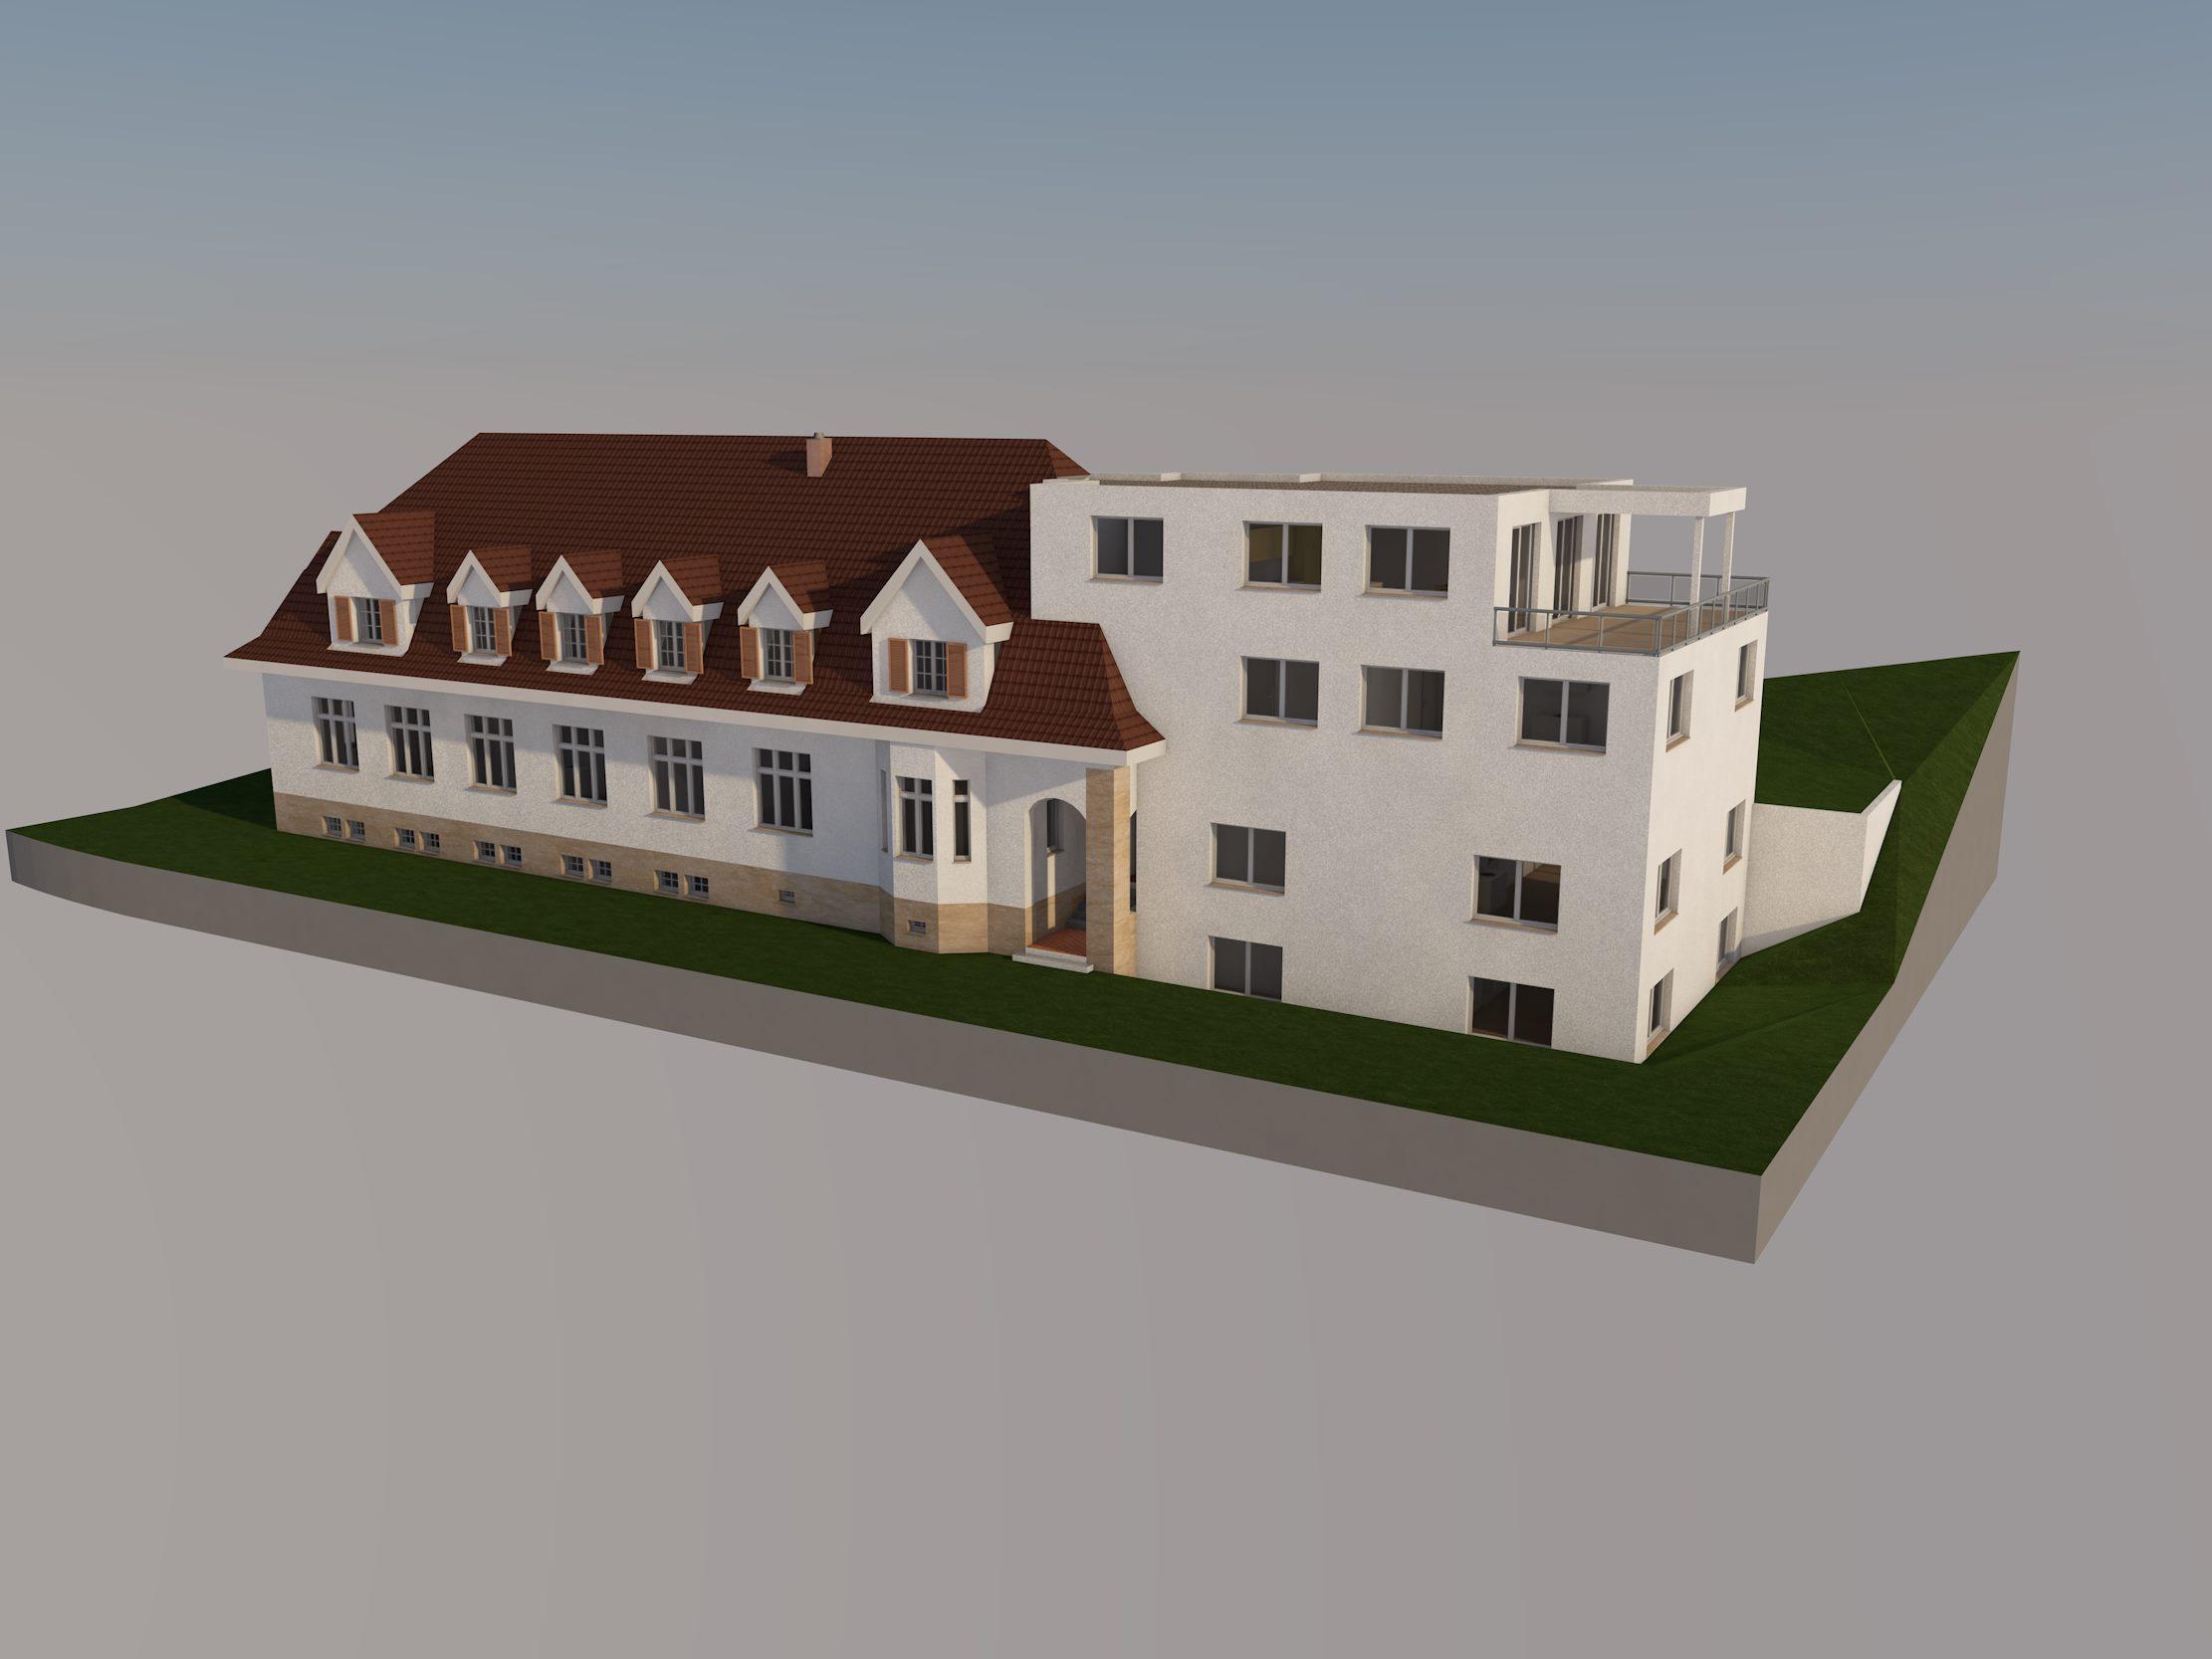 Umbau Altbau Ronner Architektur Planung Bauleitung Alt Neu modern Holz Sanierung Renovierung